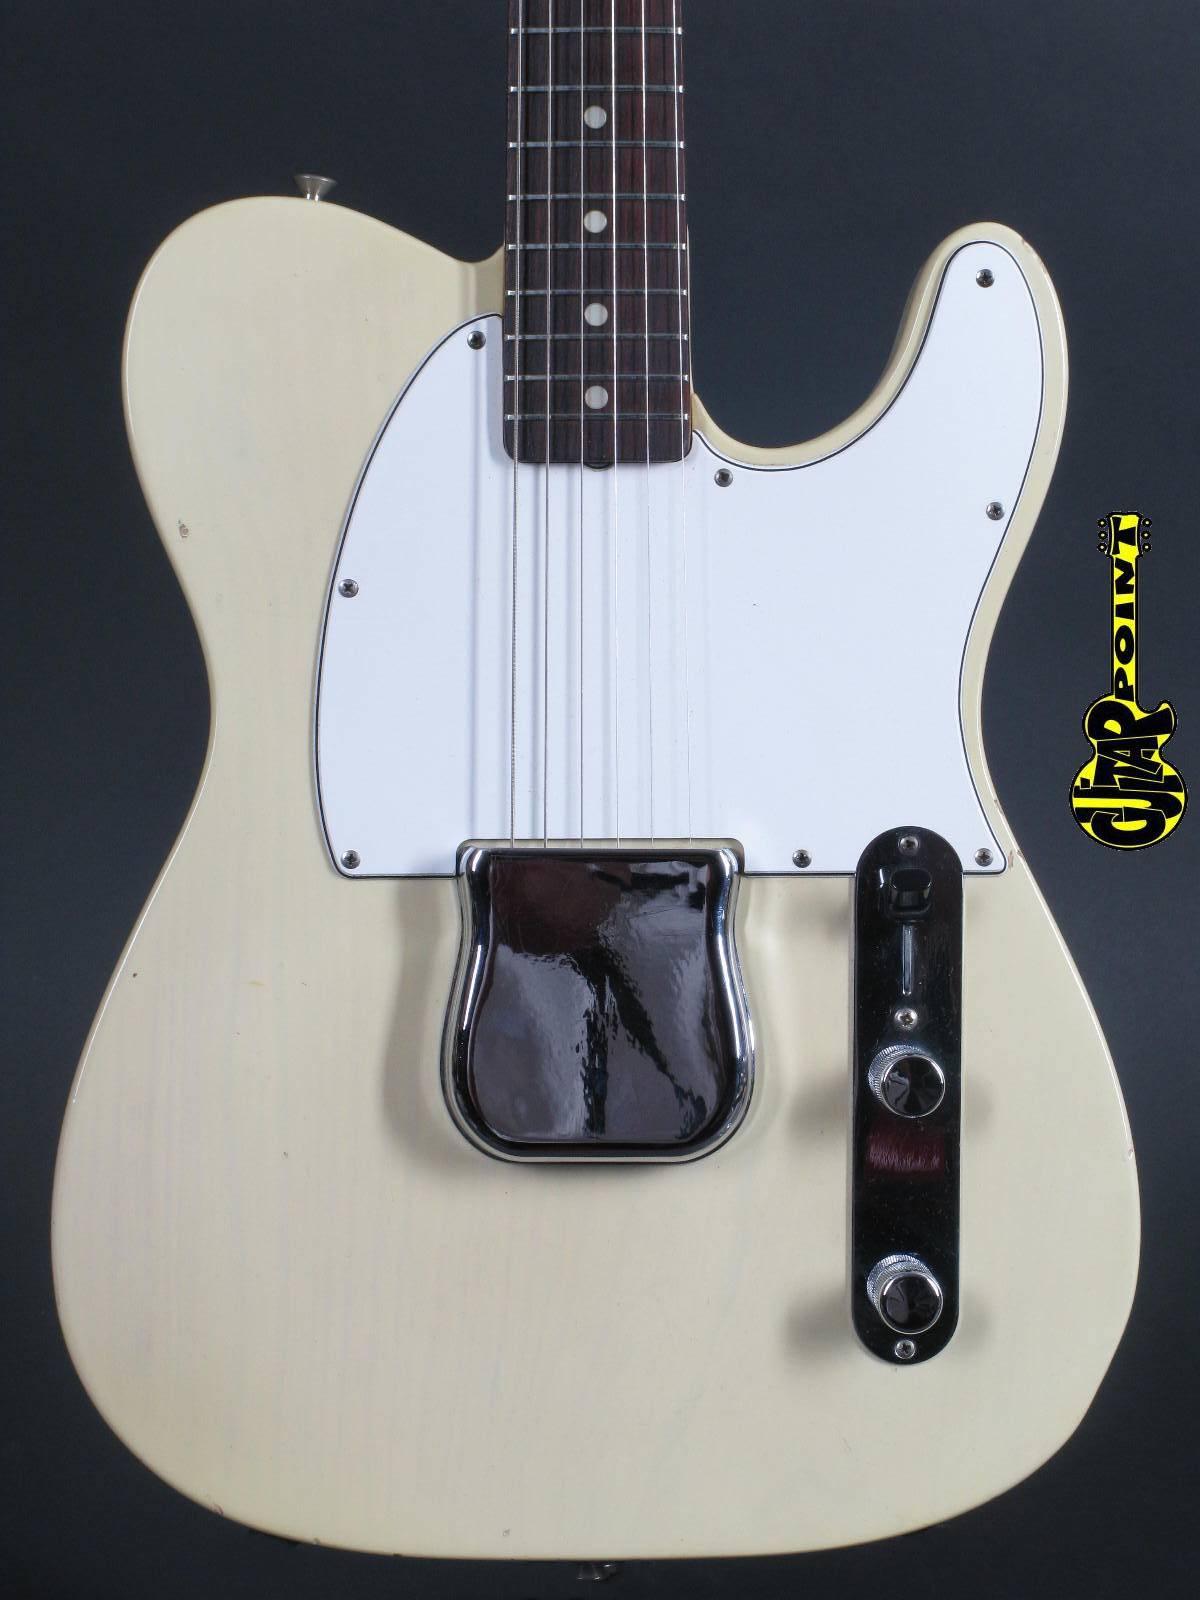 1966 Fender Esquire - Blond (Telecaster)